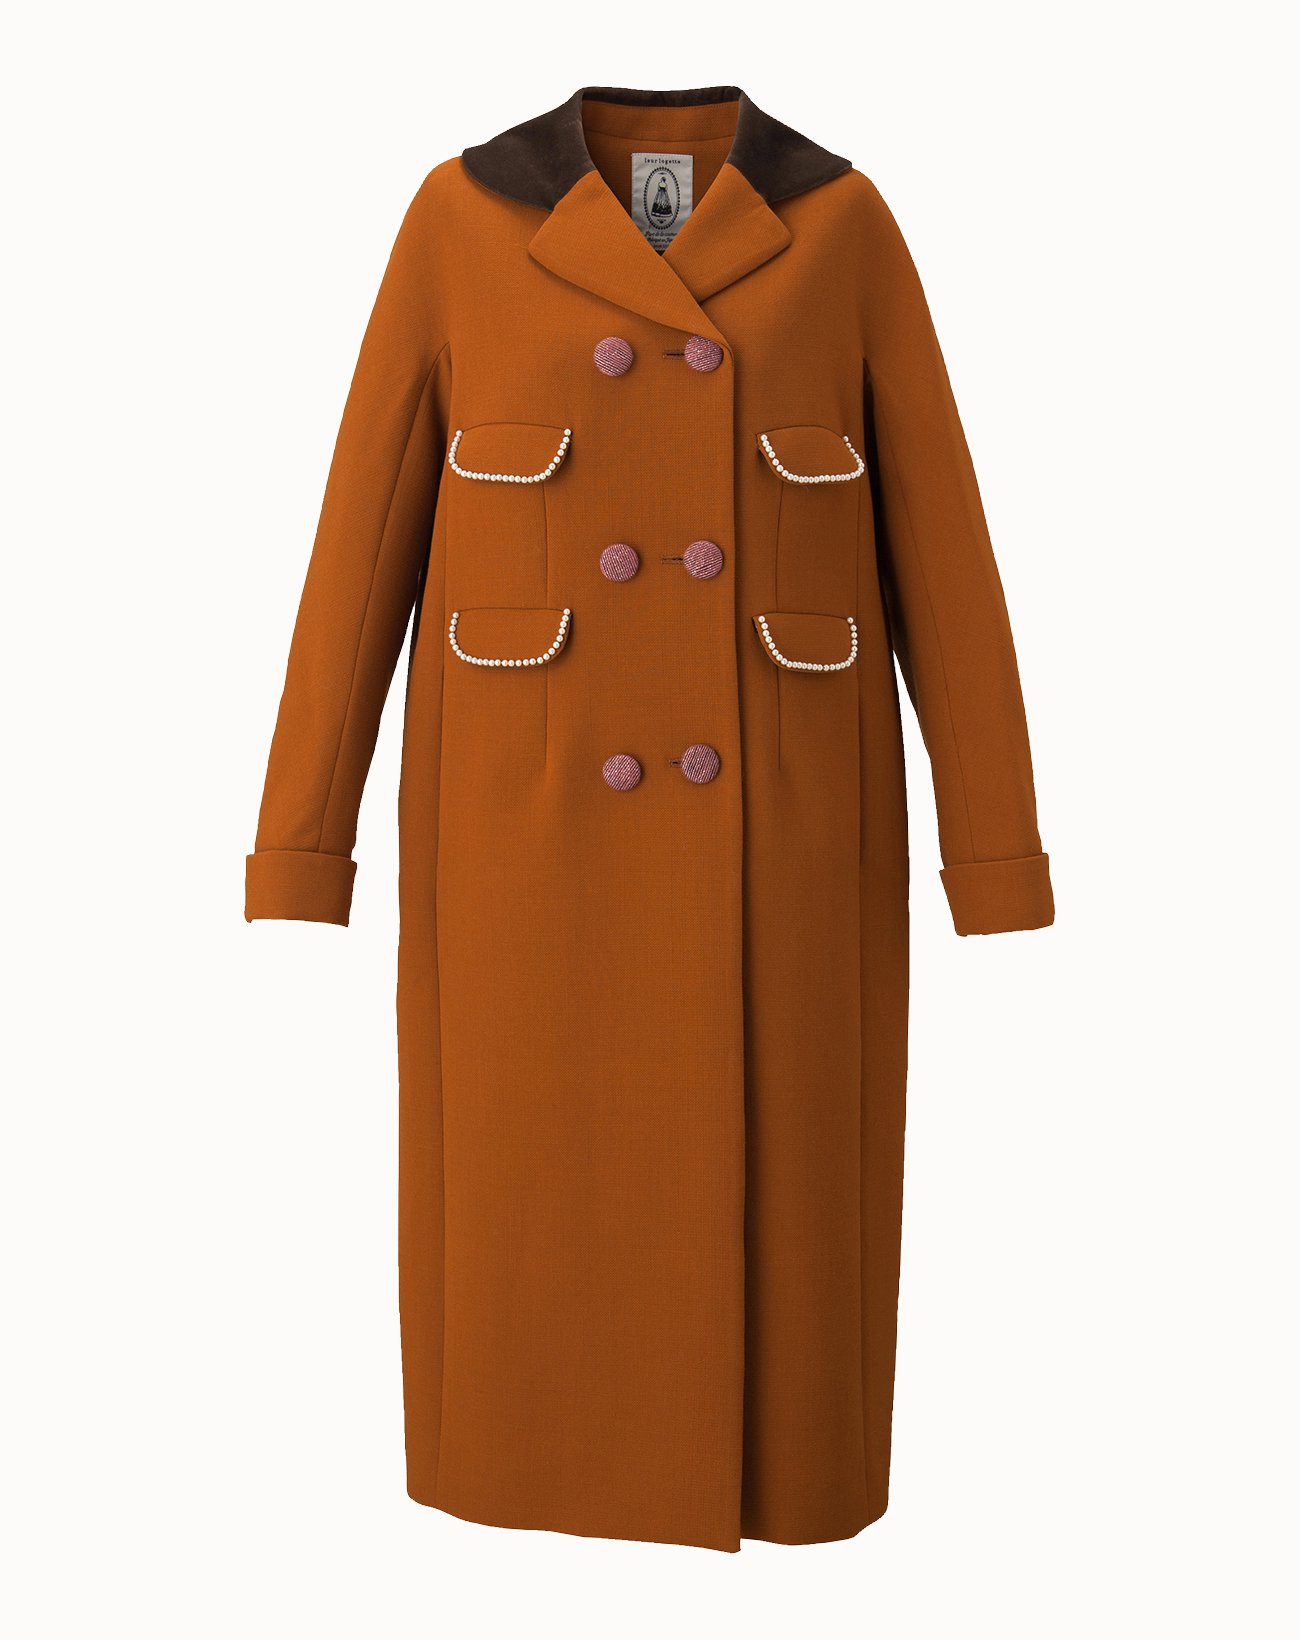 Triple Cloth Coat - Brown